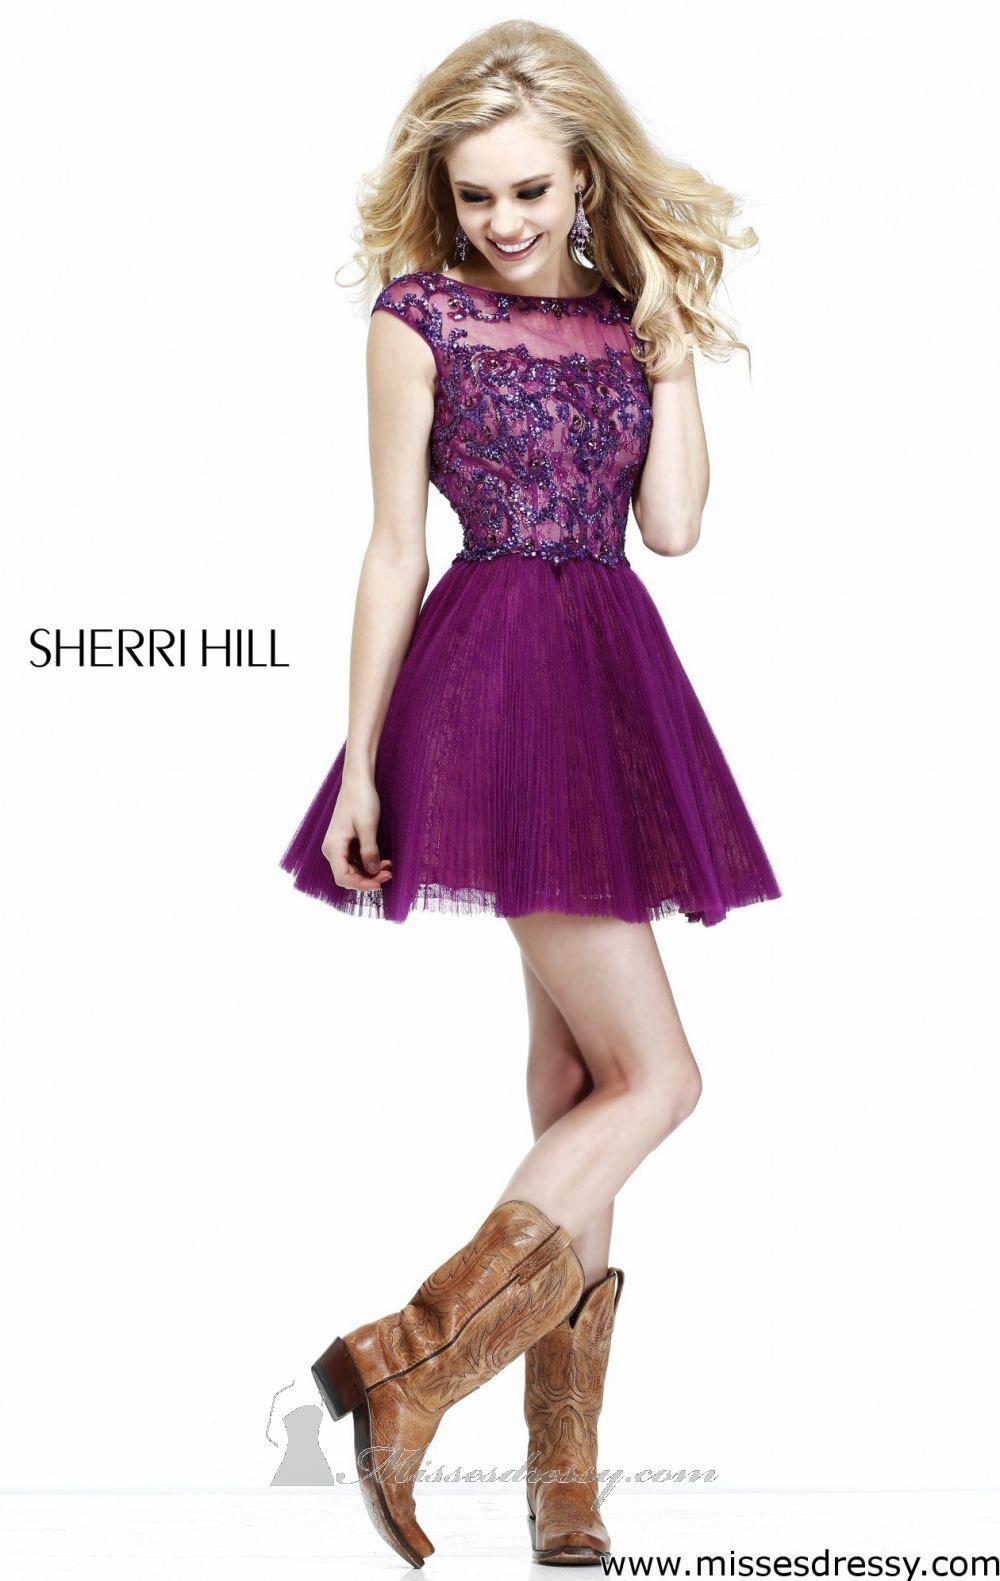 A-Line Appliqued Dress by Sherri Hill | UX/UI Designer, Dresses and ...